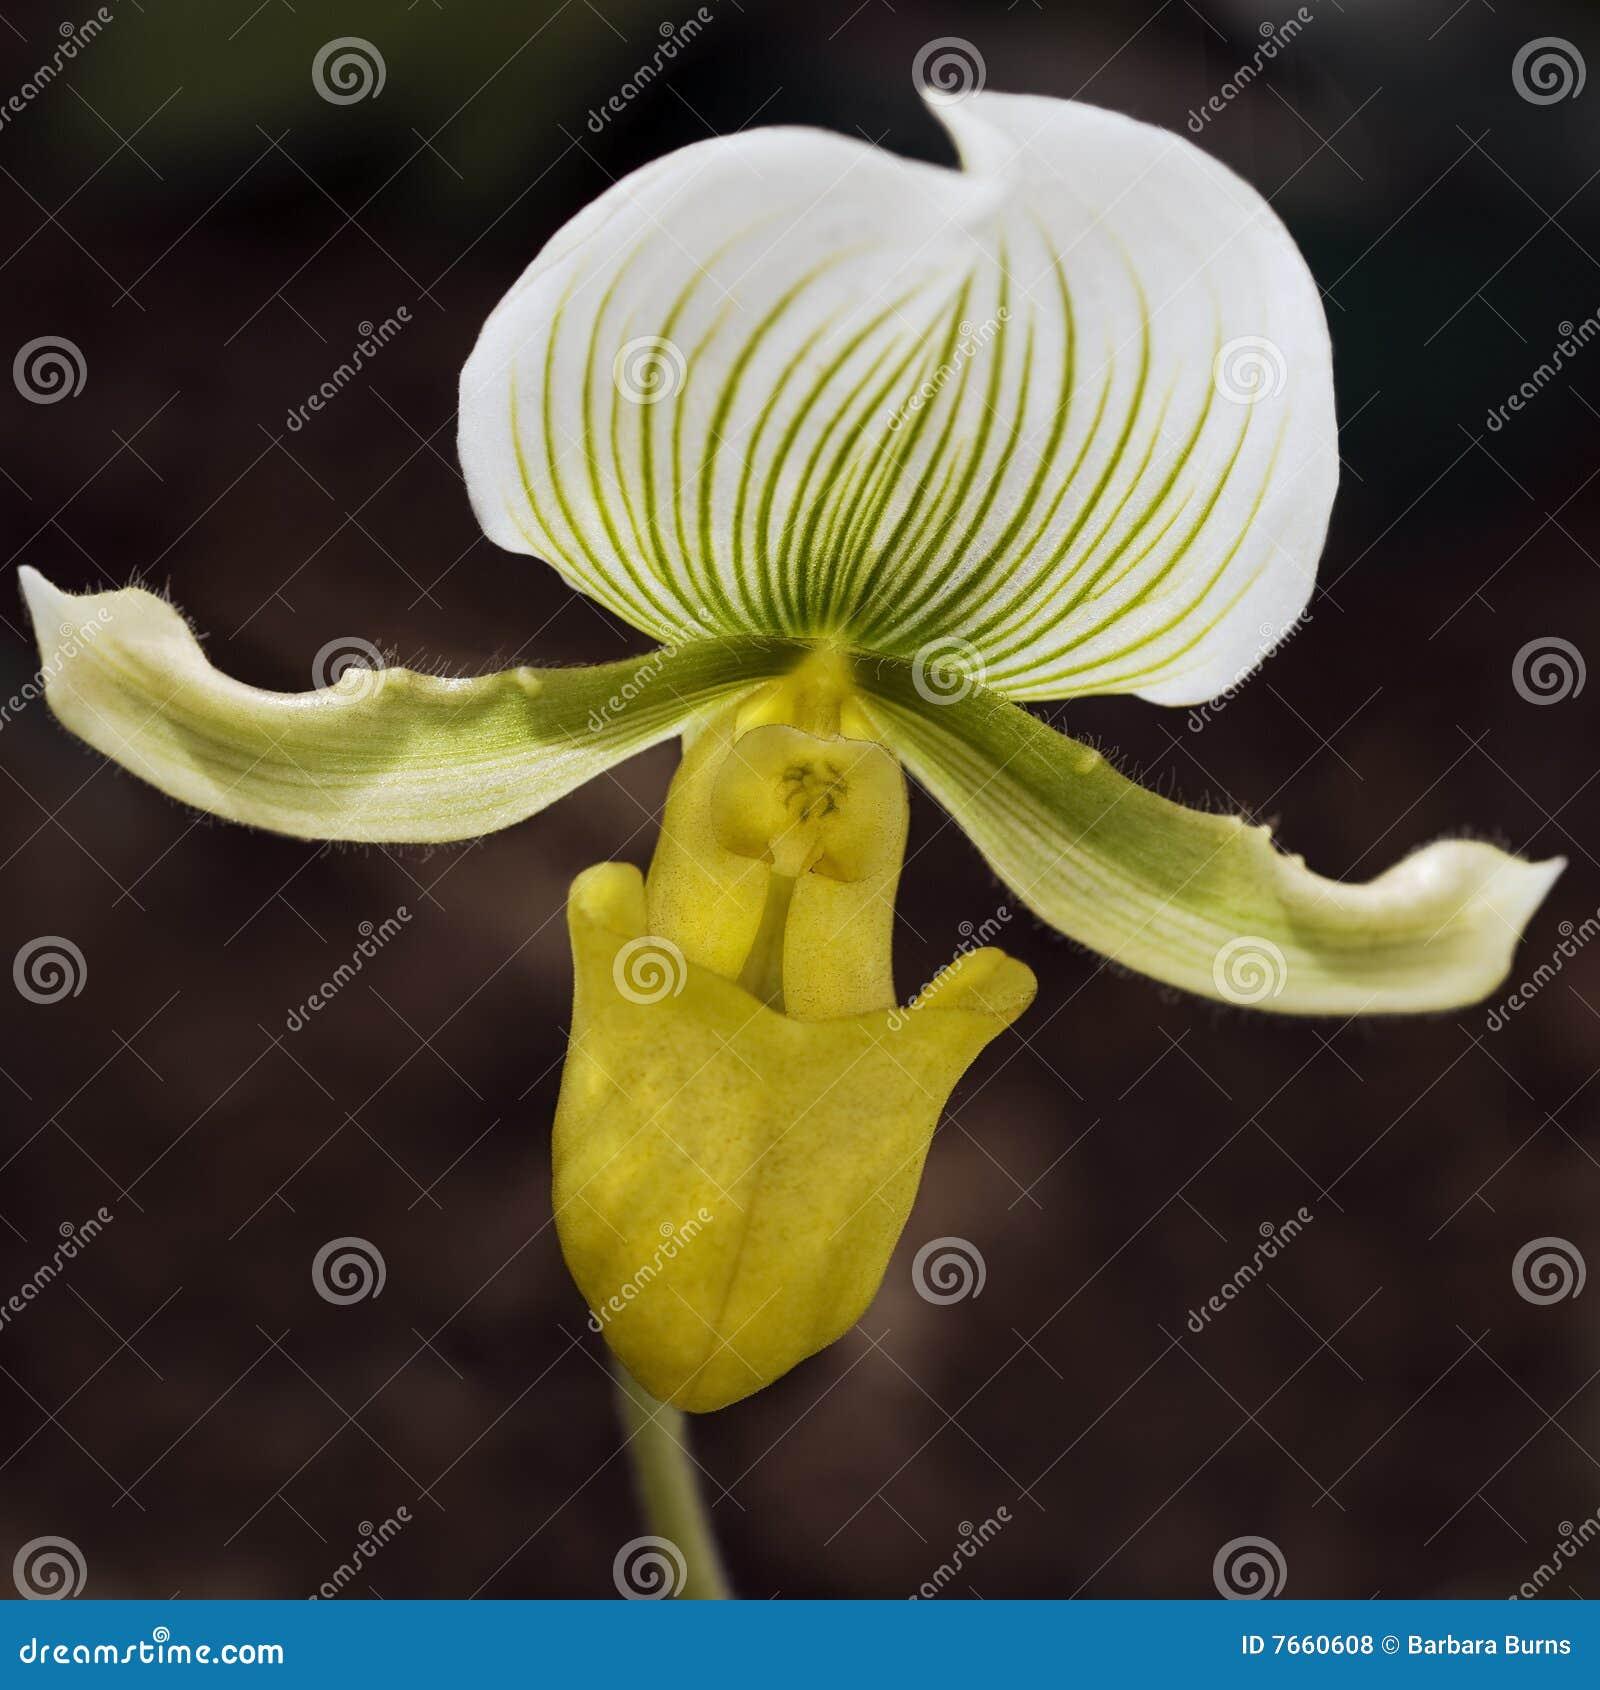 frauenschuh orchidee lizenzfreie stockfotos bild 7660608. Black Bedroom Furniture Sets. Home Design Ideas